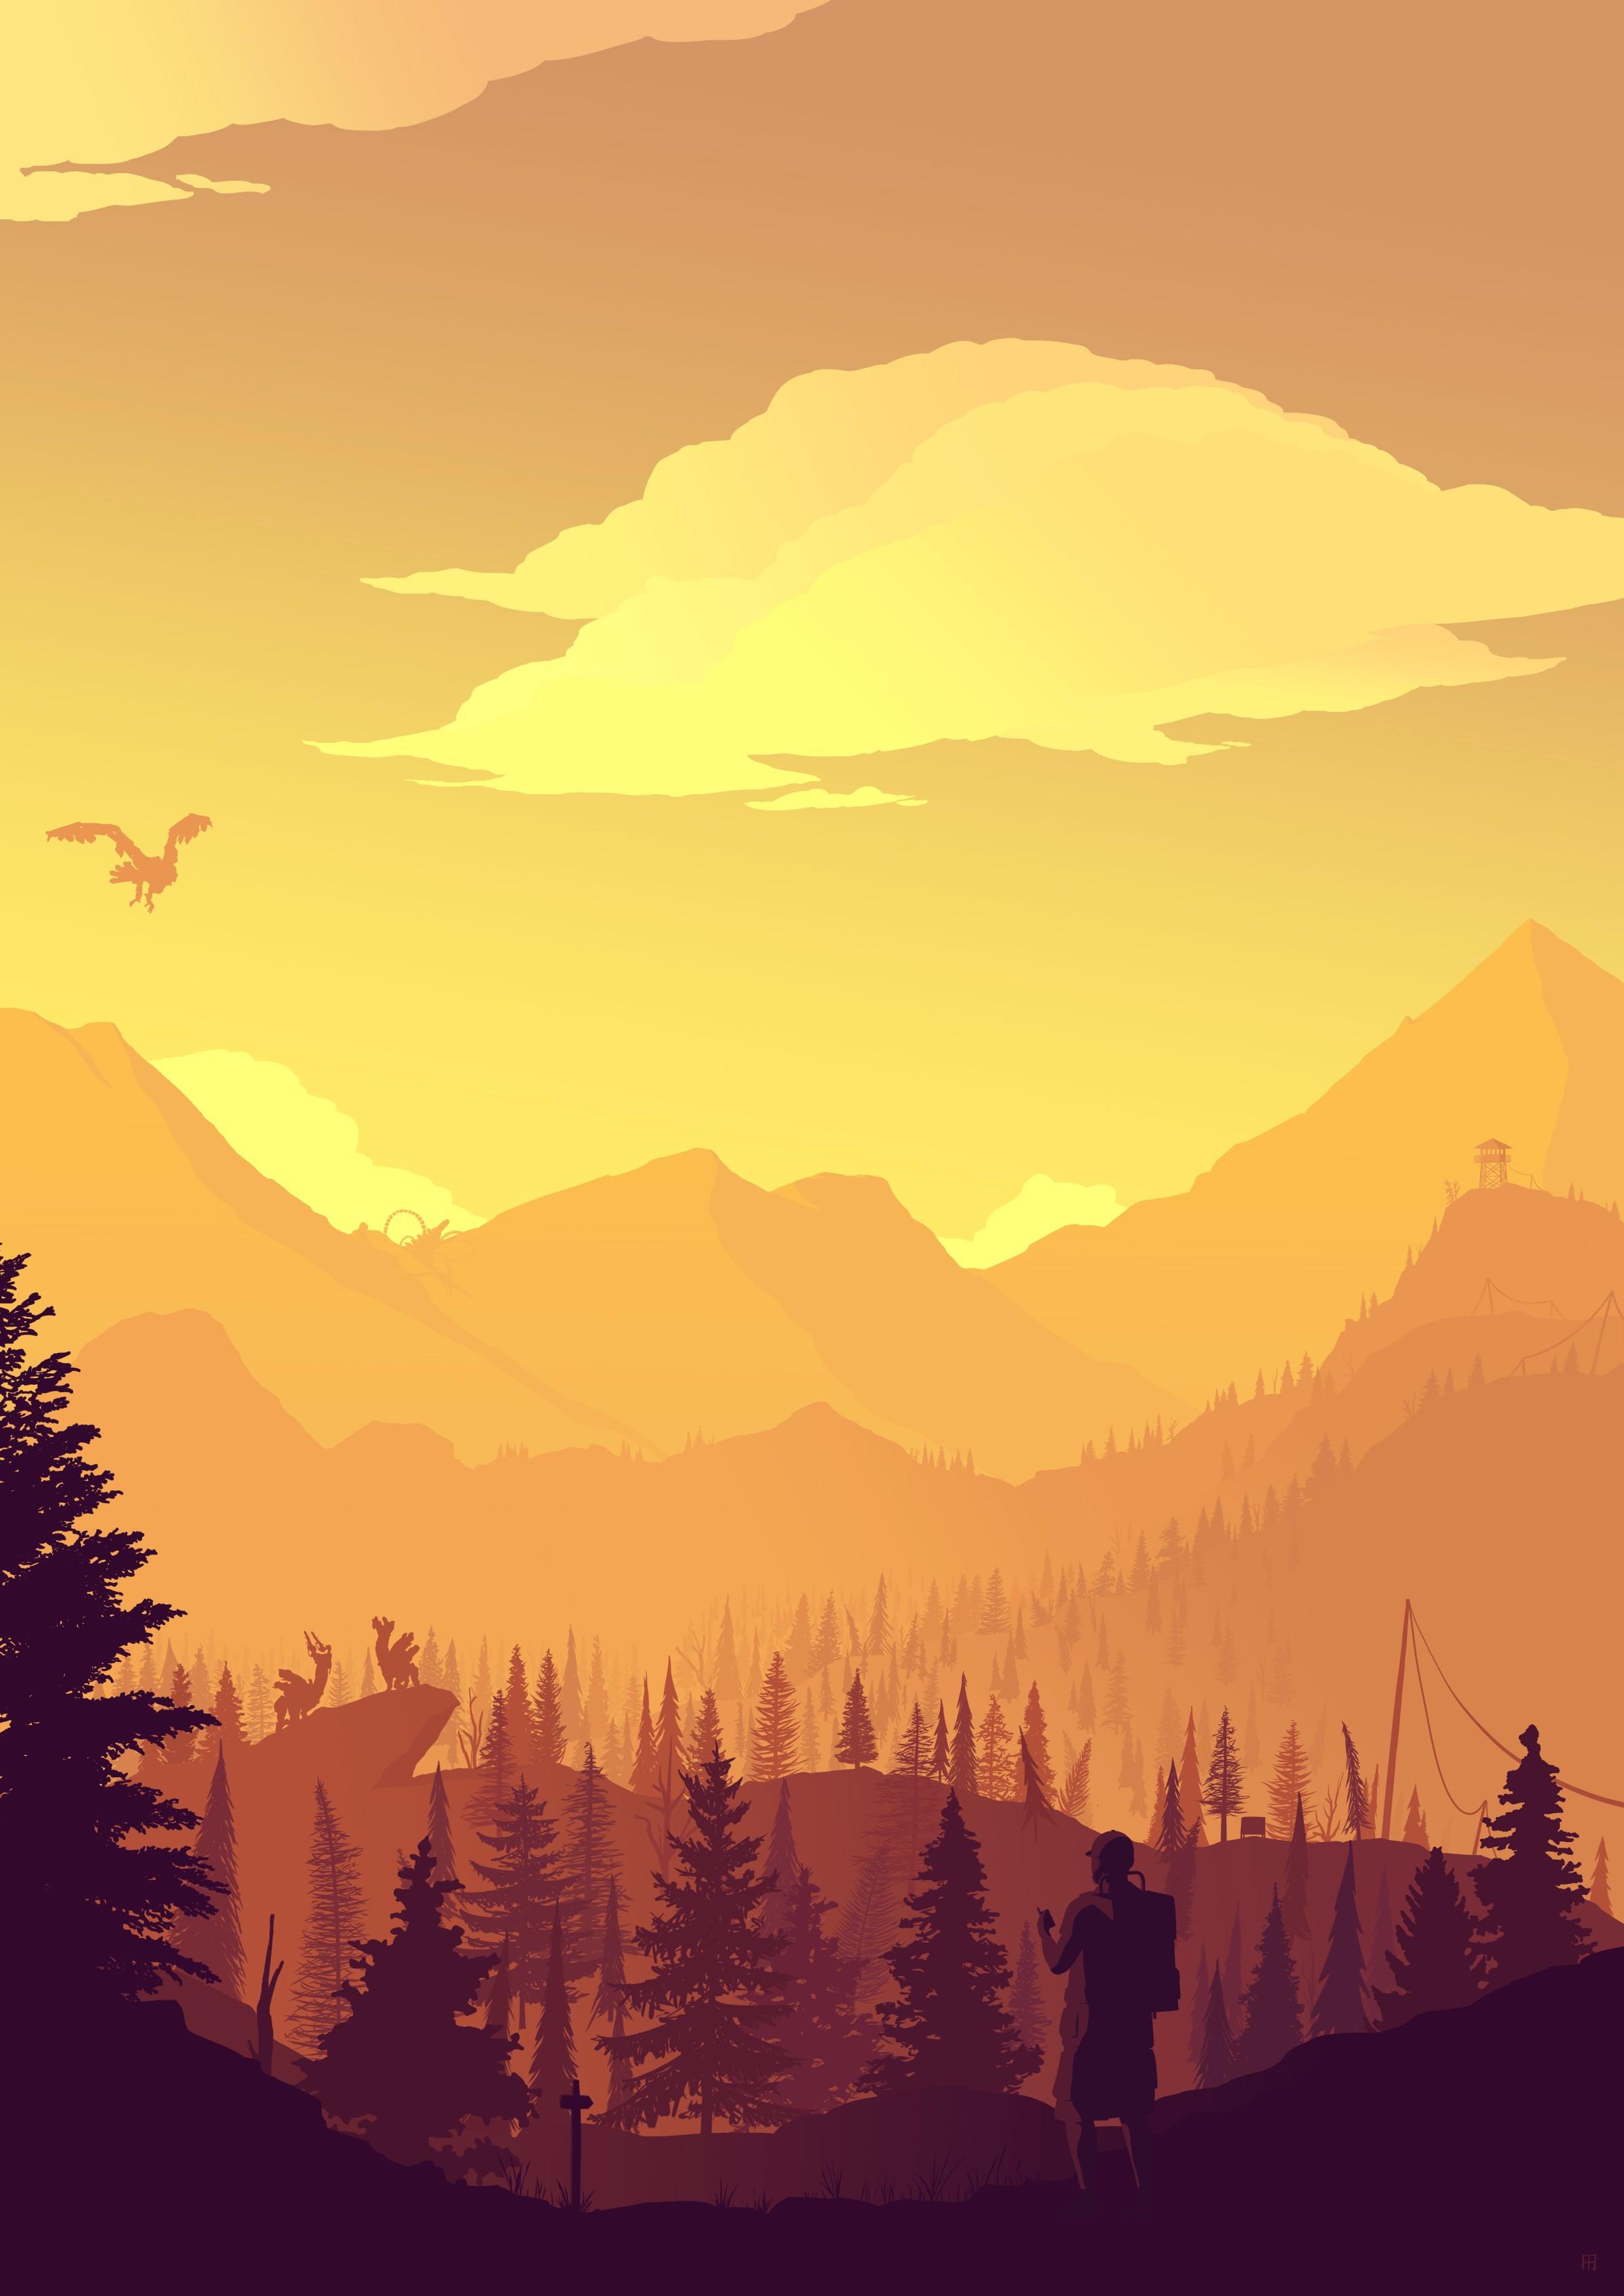 Firewatch Zero Dawn Digital 2D, october 2019